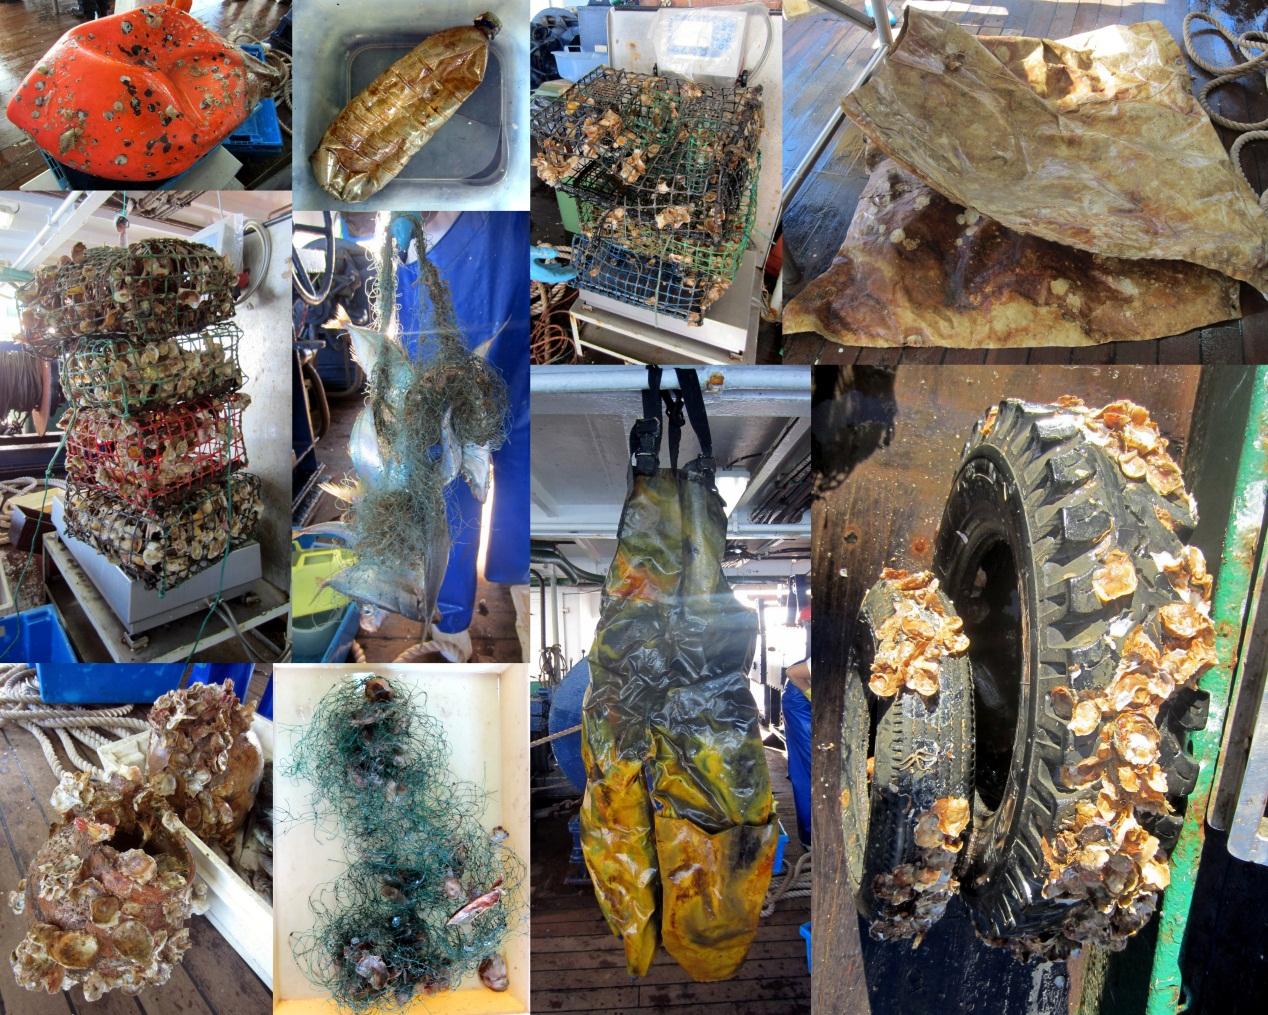 O lixo que se recolhe no fundo do oceano